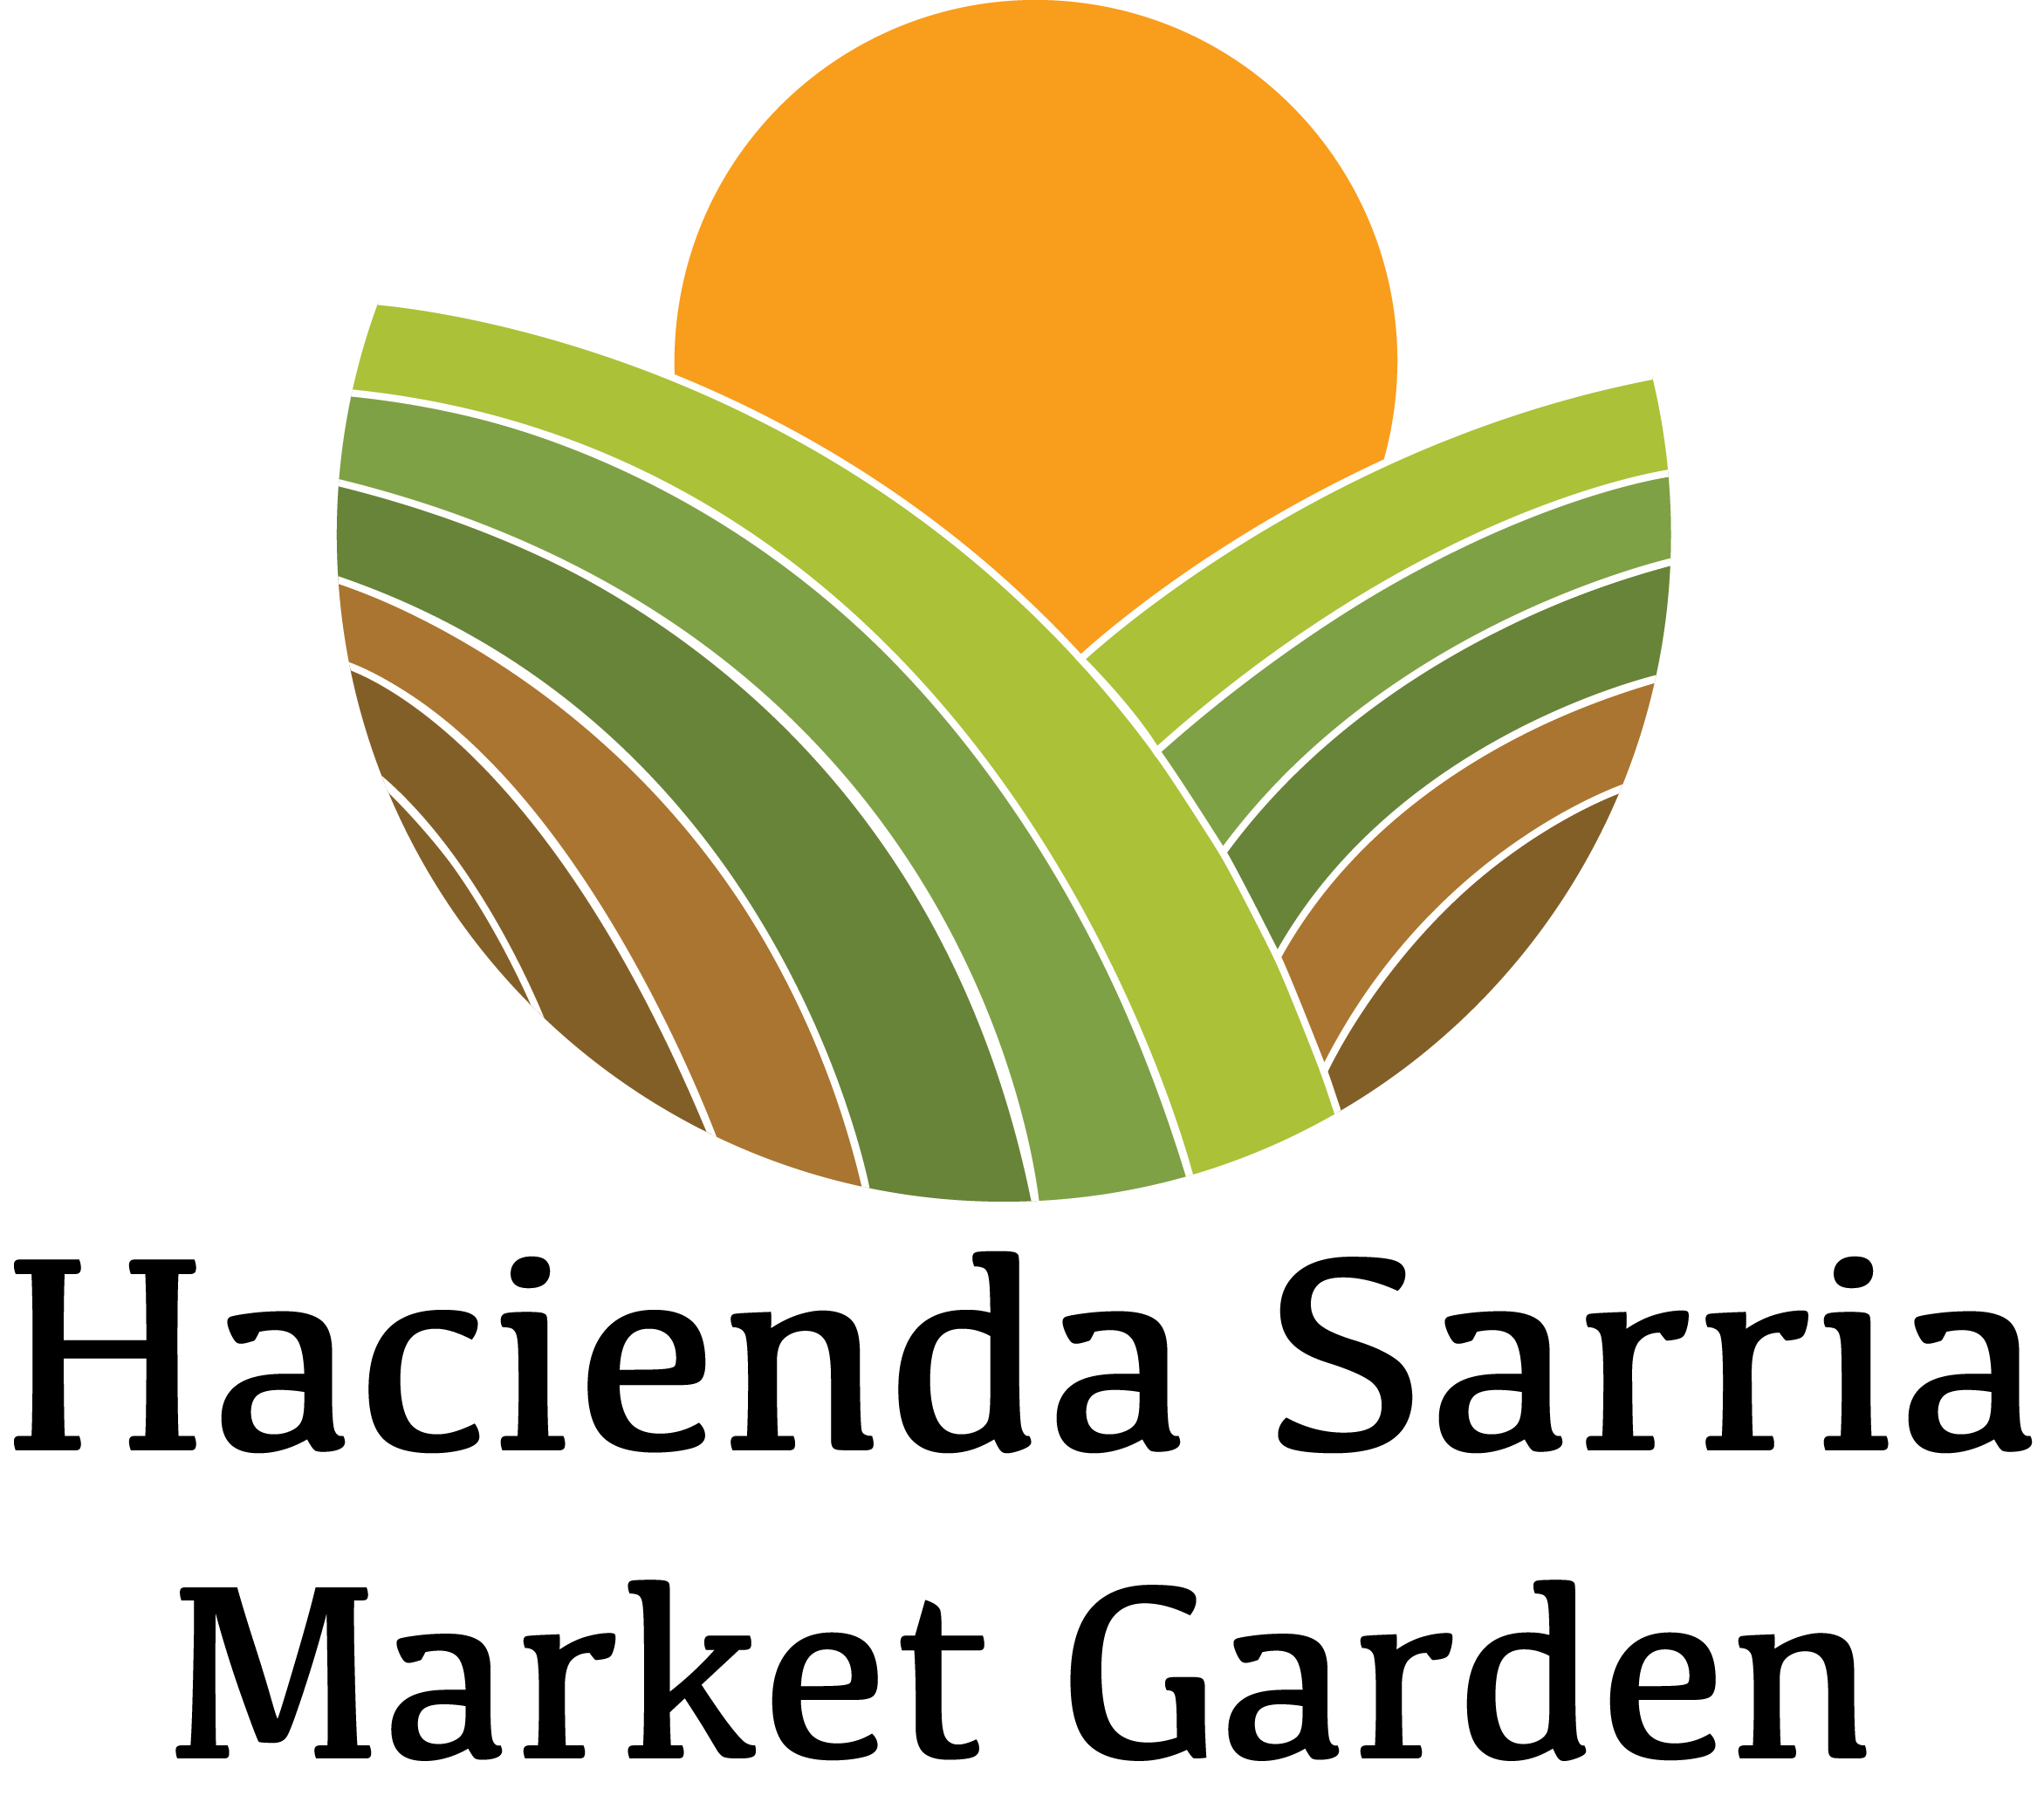 Hacienda sarria market garden. Volunteering clipart sustainability